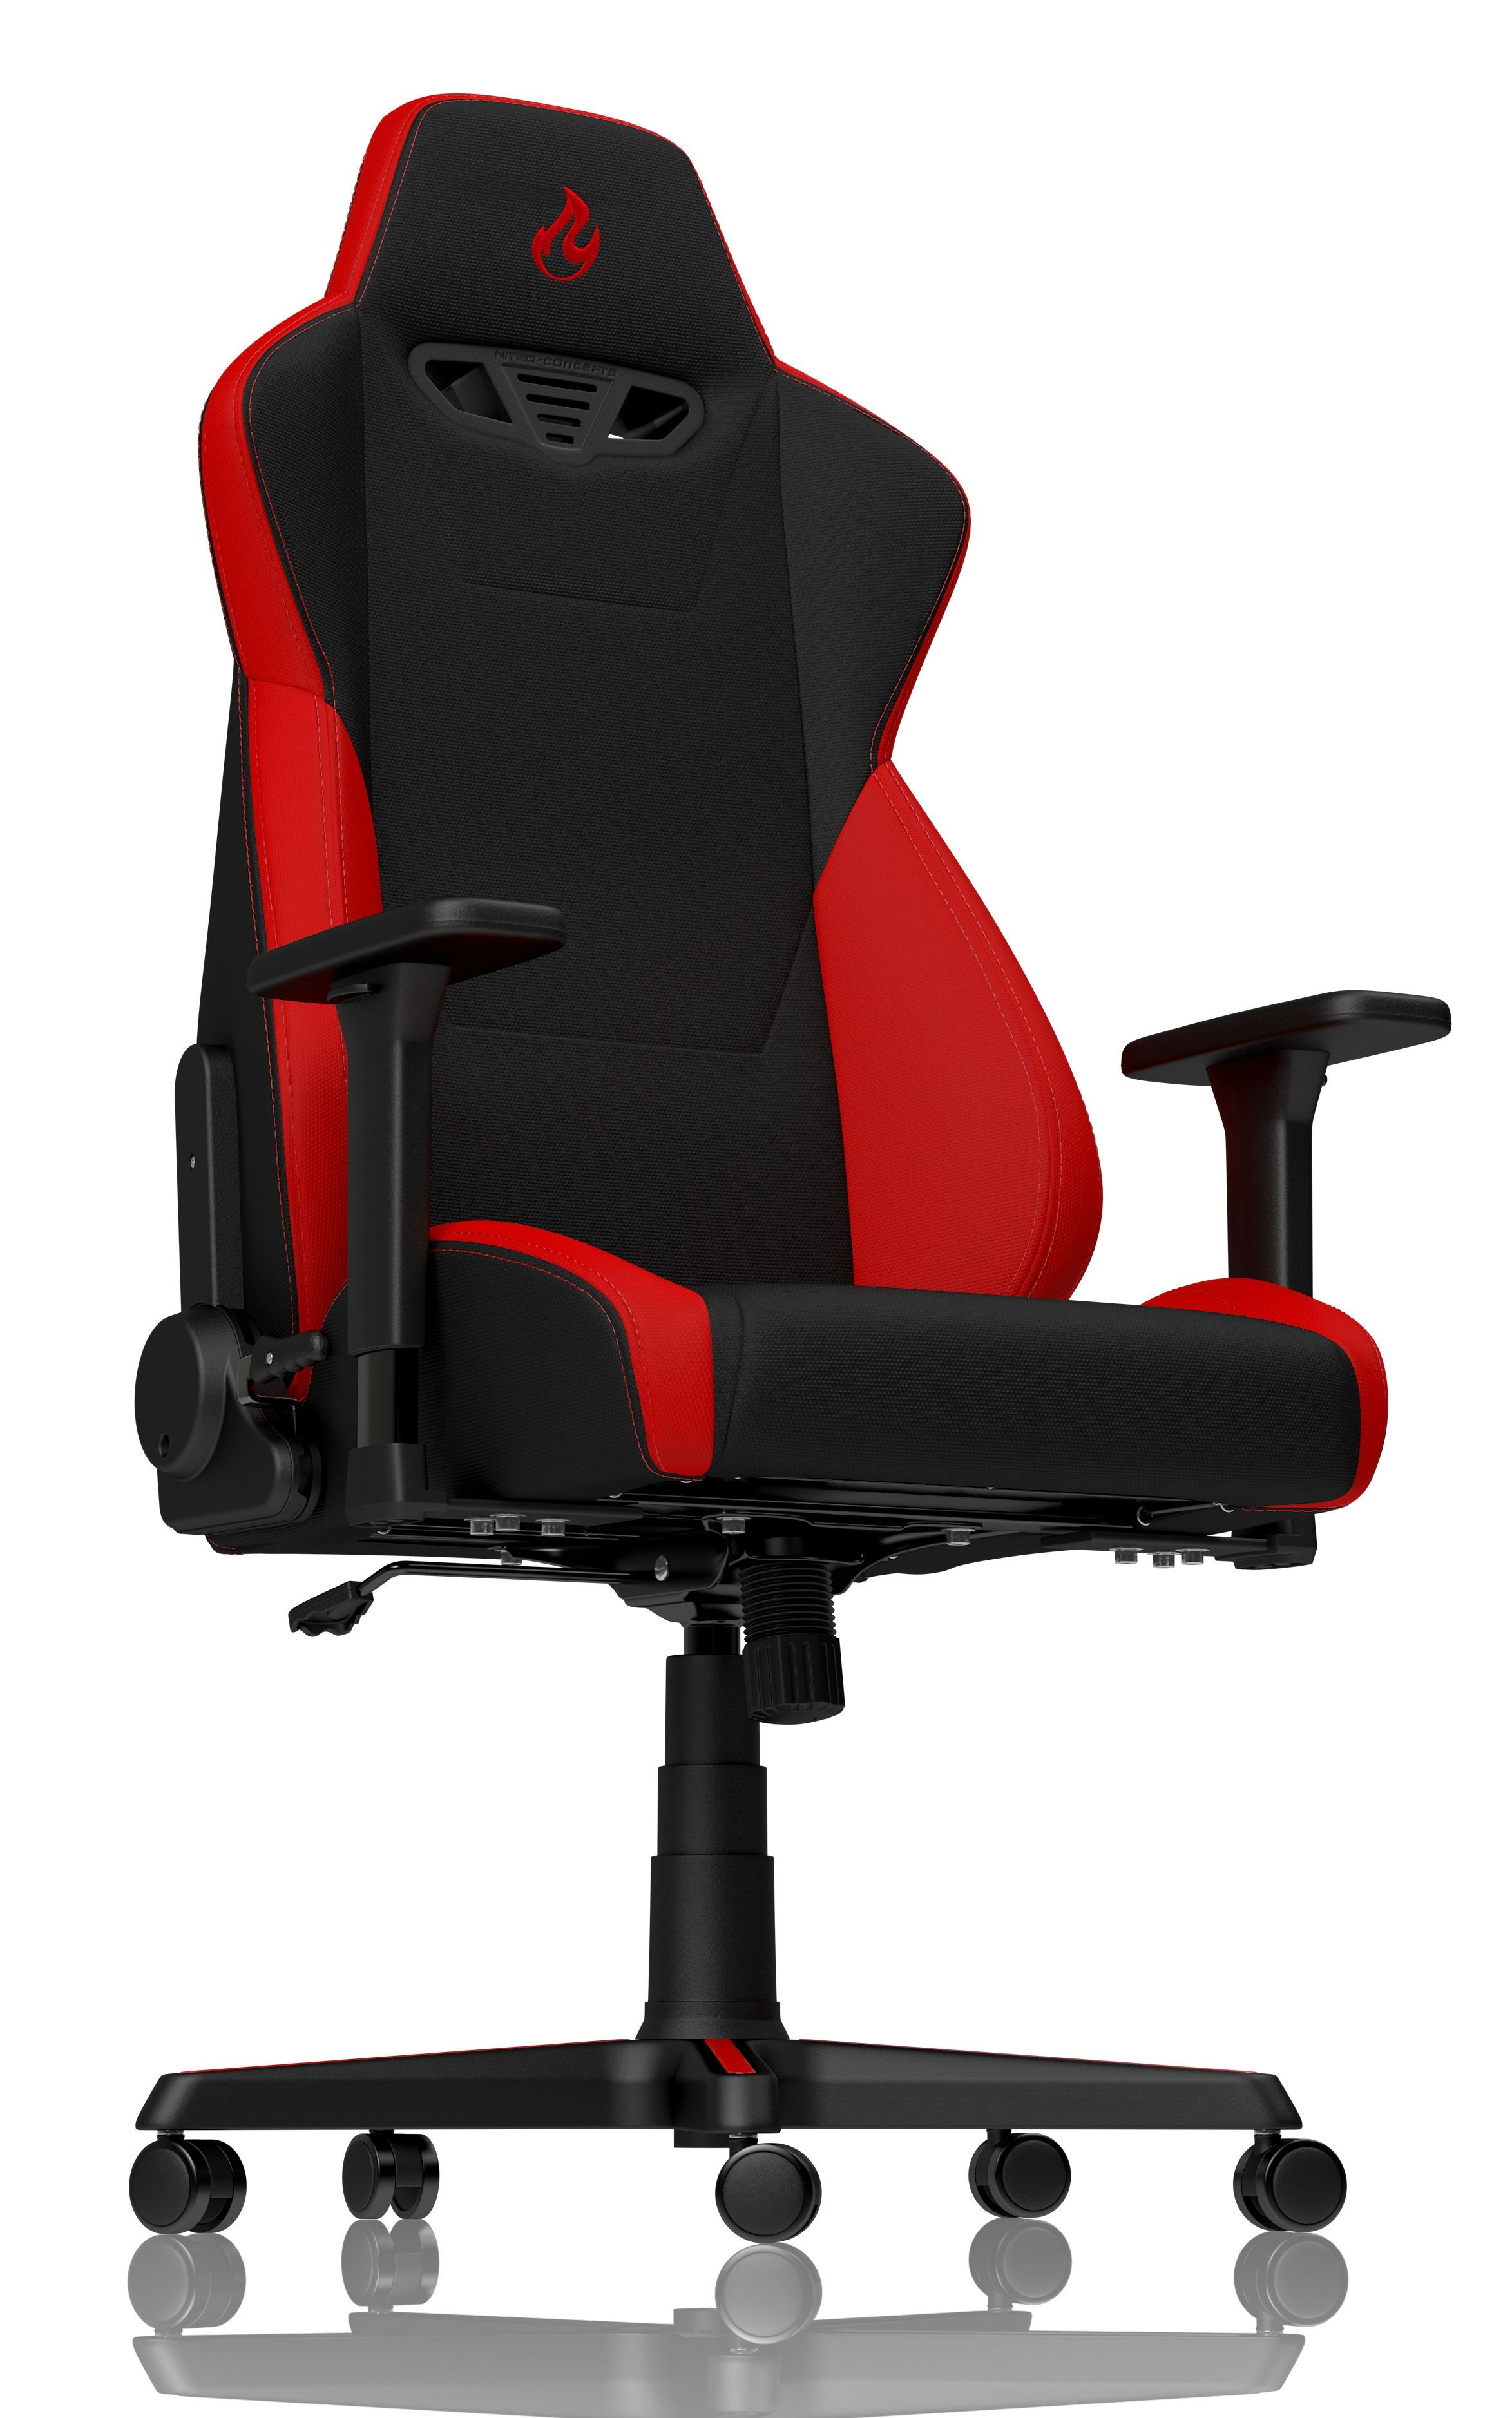 Гейминг стол Nitro Concepts - S300, inferno red - 2